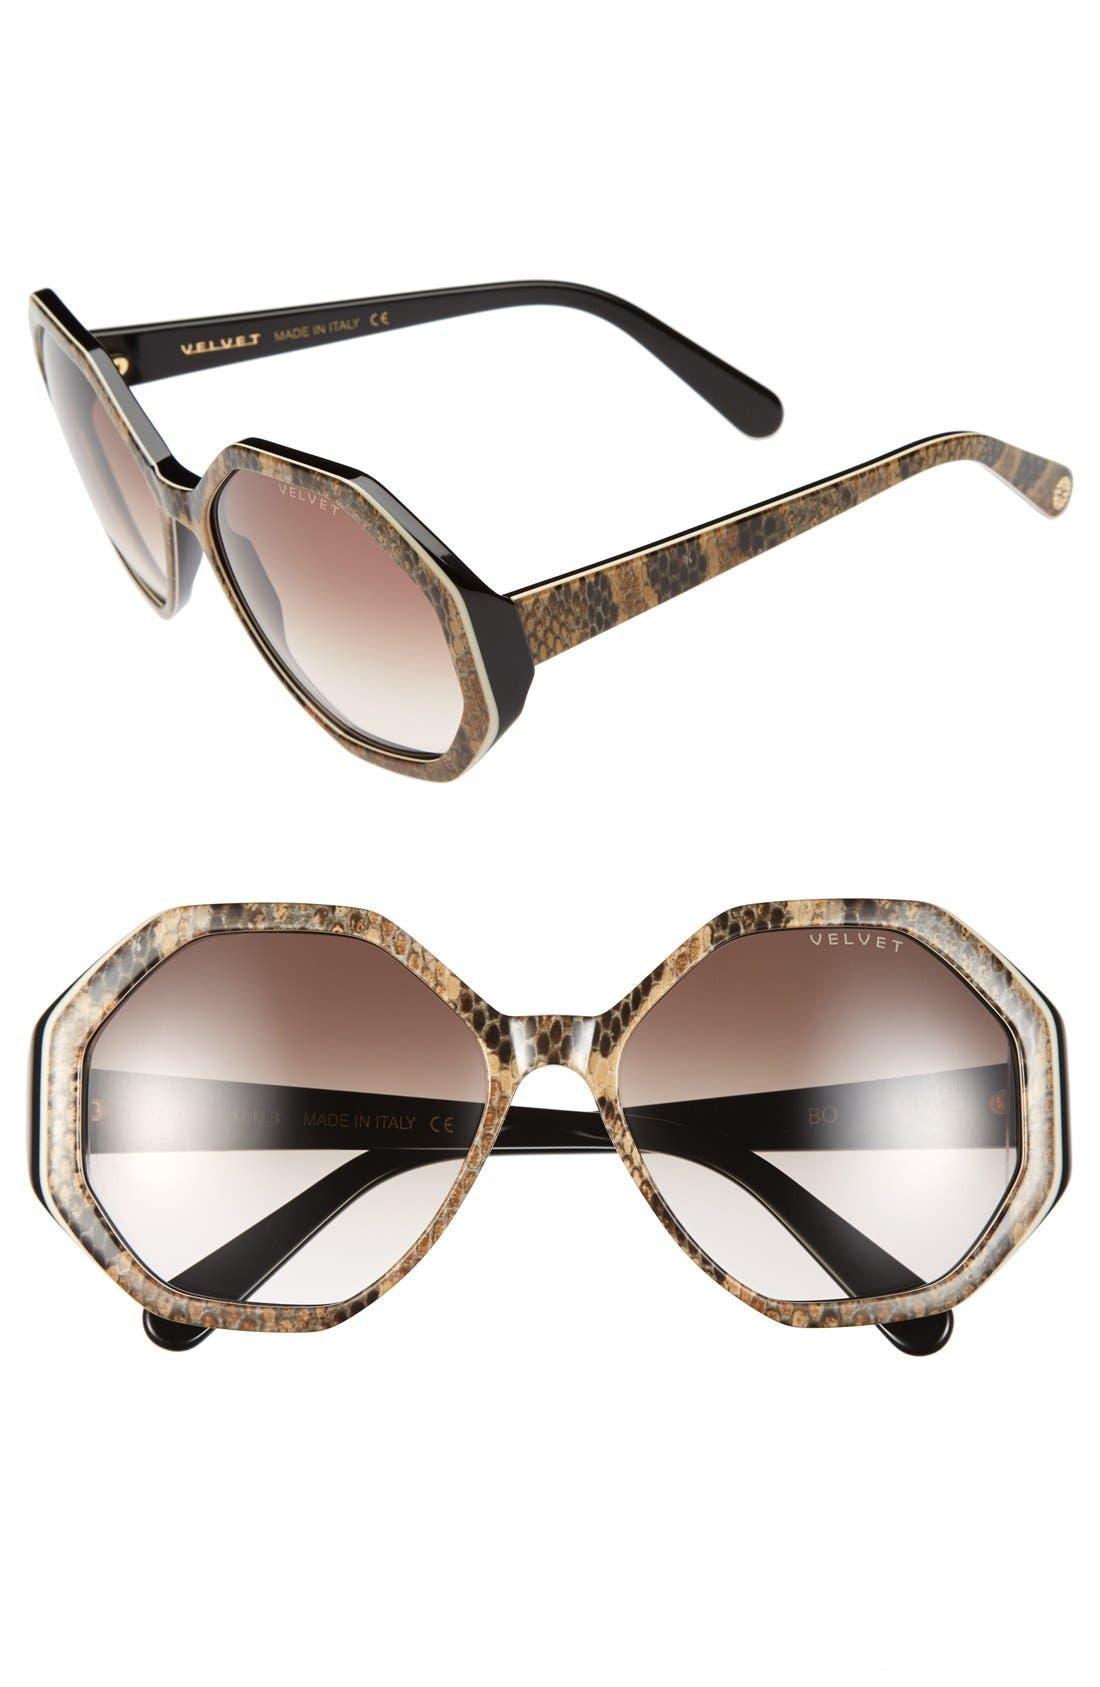 Alternate Image 1 Selected - Velvet Eyewear 'Jami' 56mm Sunglasses